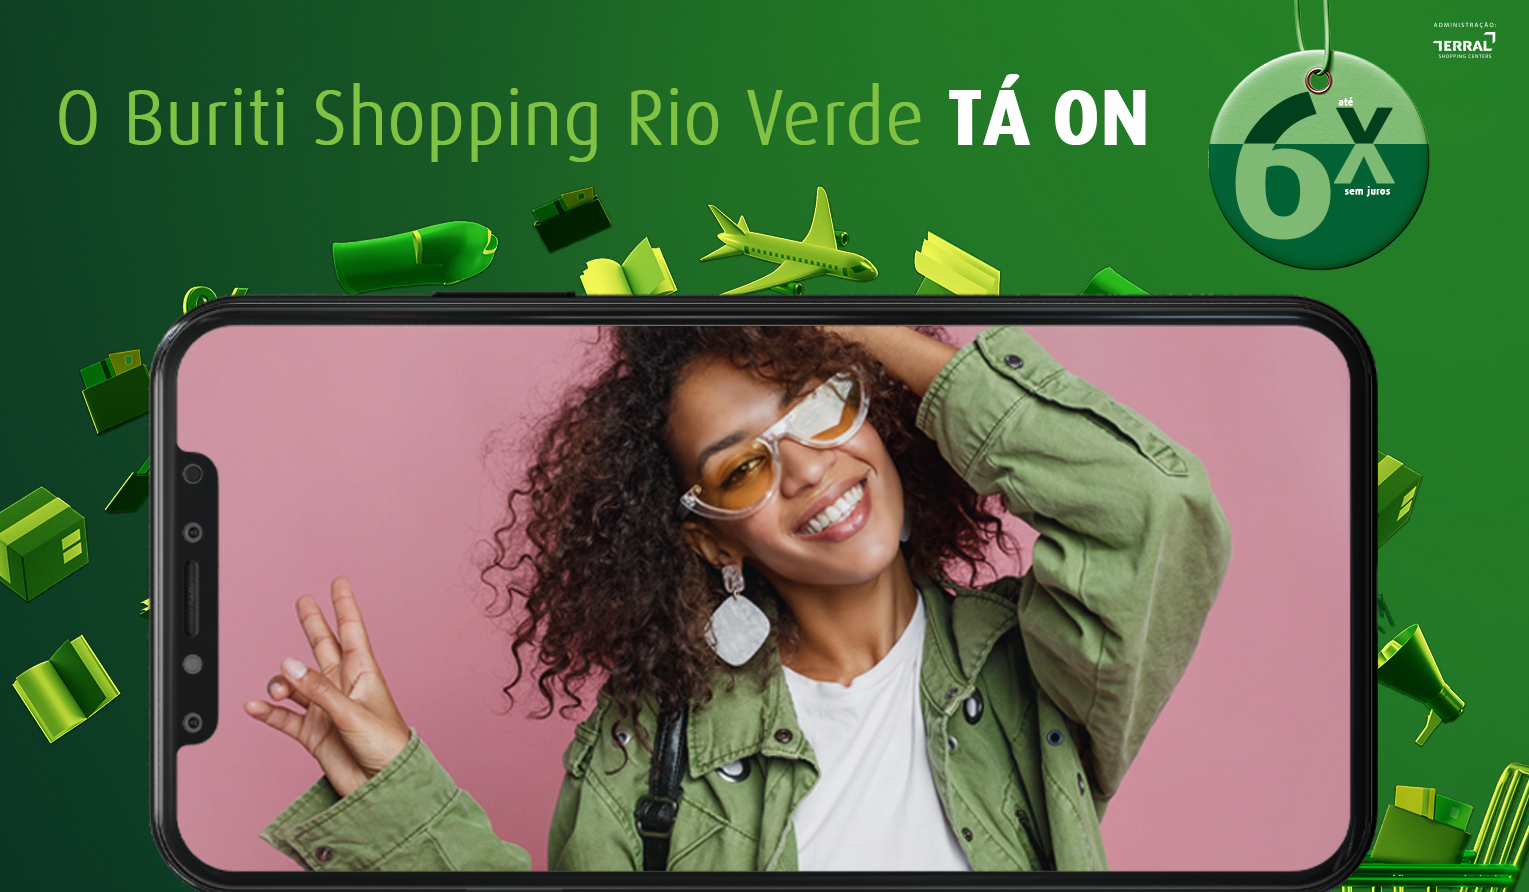 Marketplace - Buriti Rio Verde